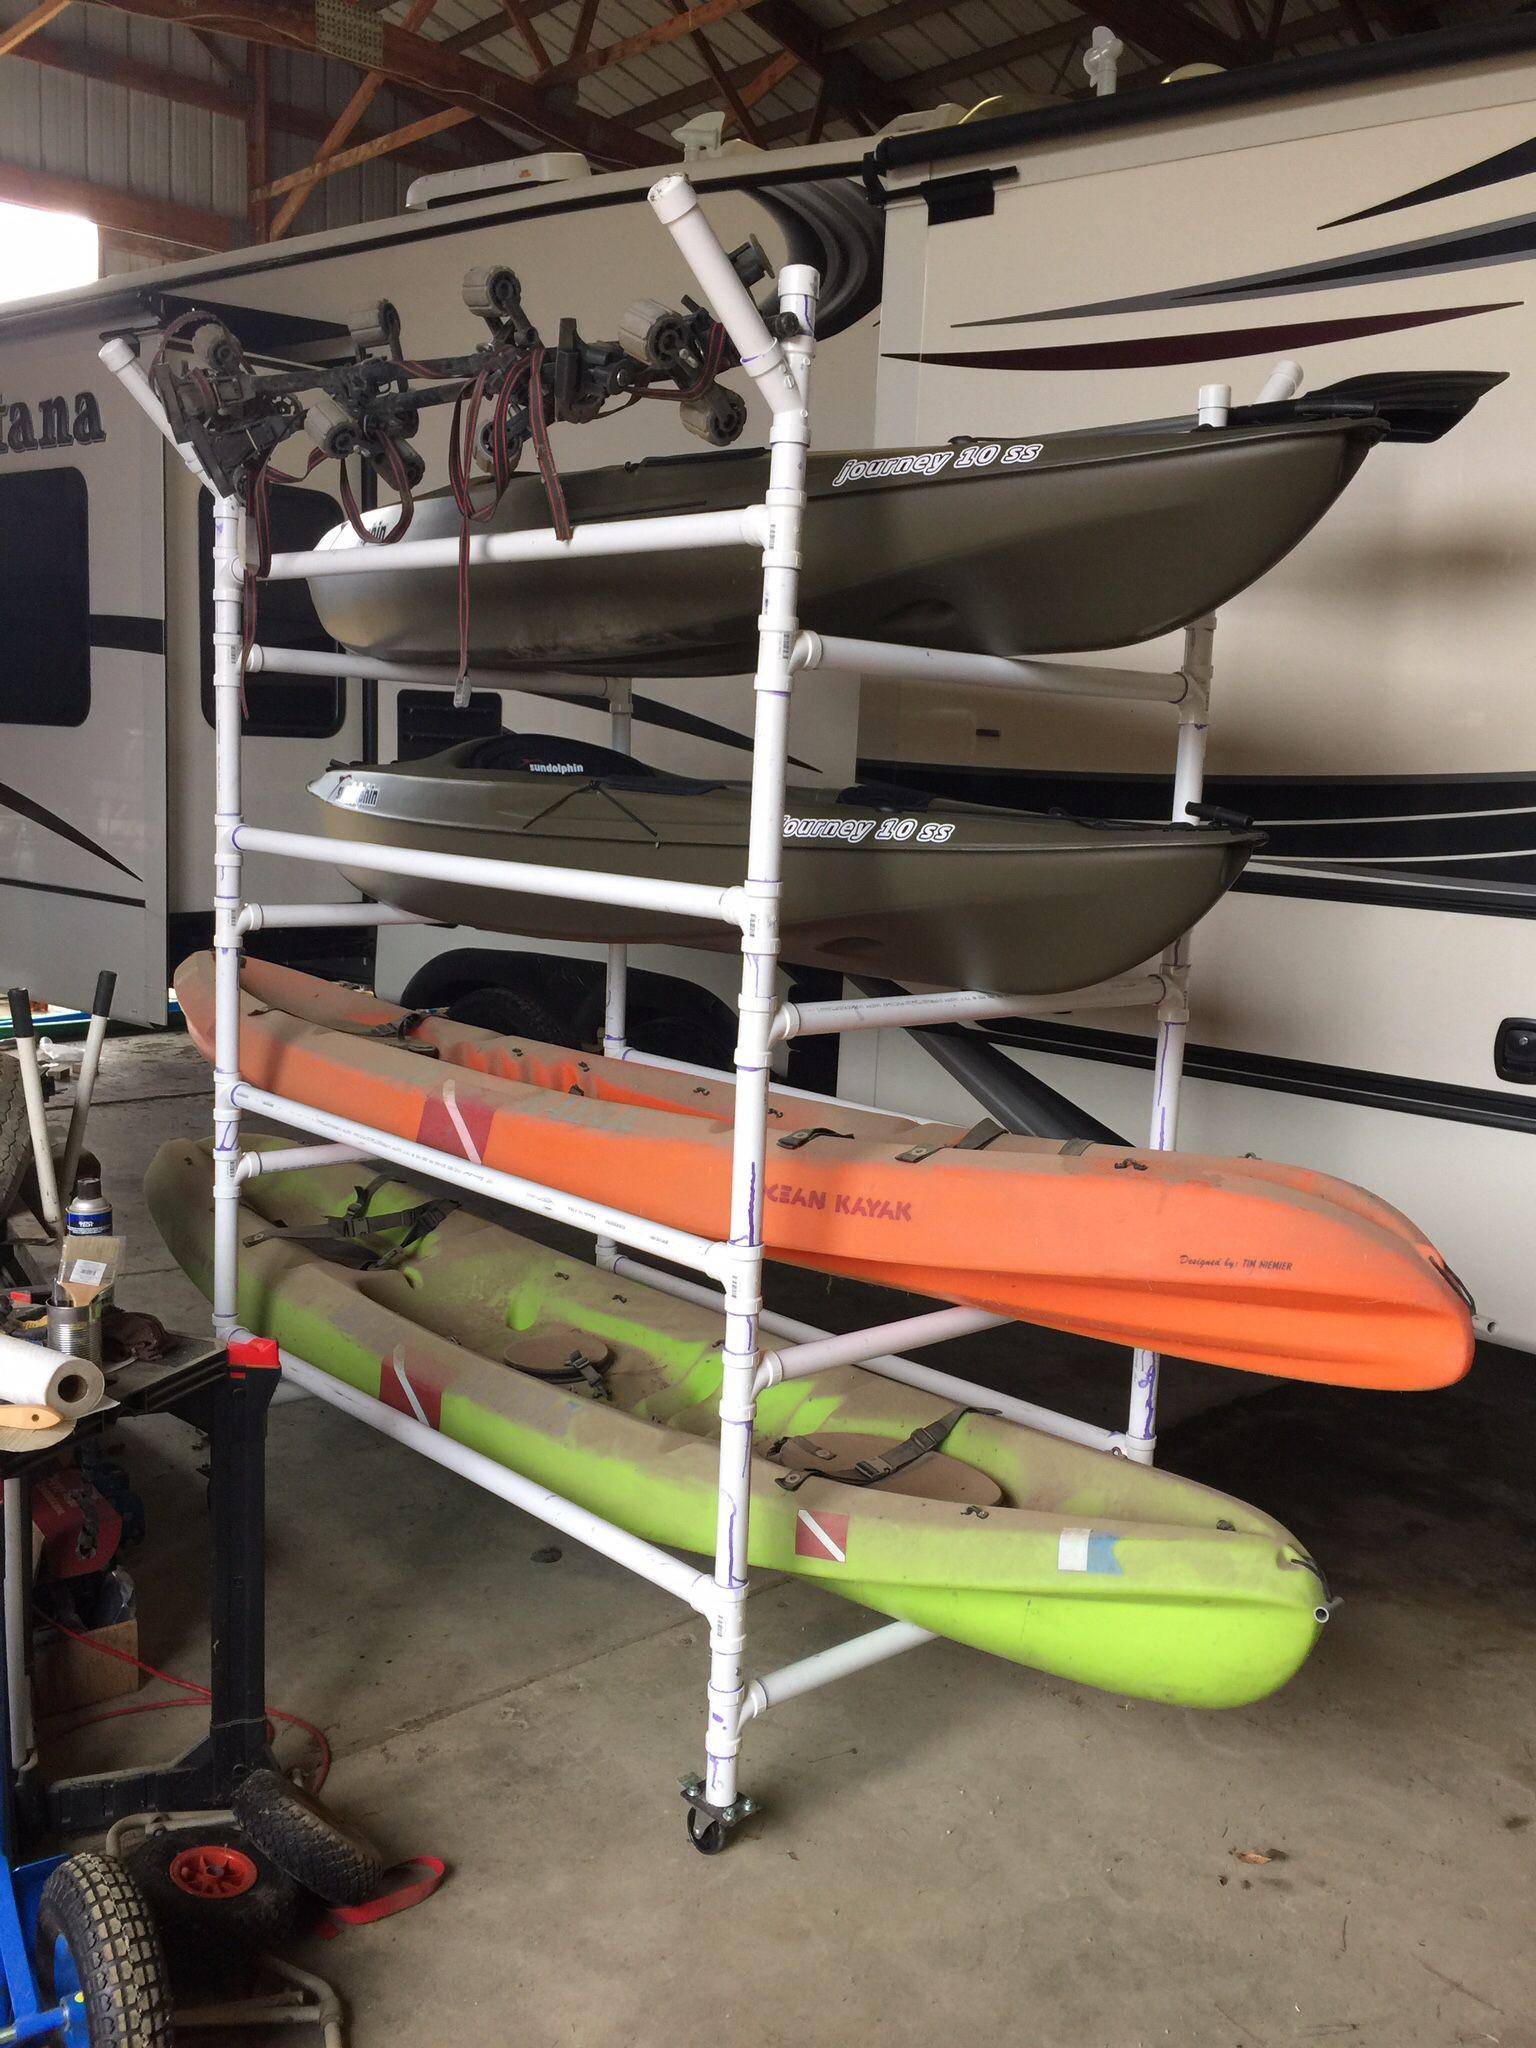 Best ideas about DIY Pvc Kayak Rack . Save or Pin Homemade PVC kayak rack can store 4 kayaks paddles Now.